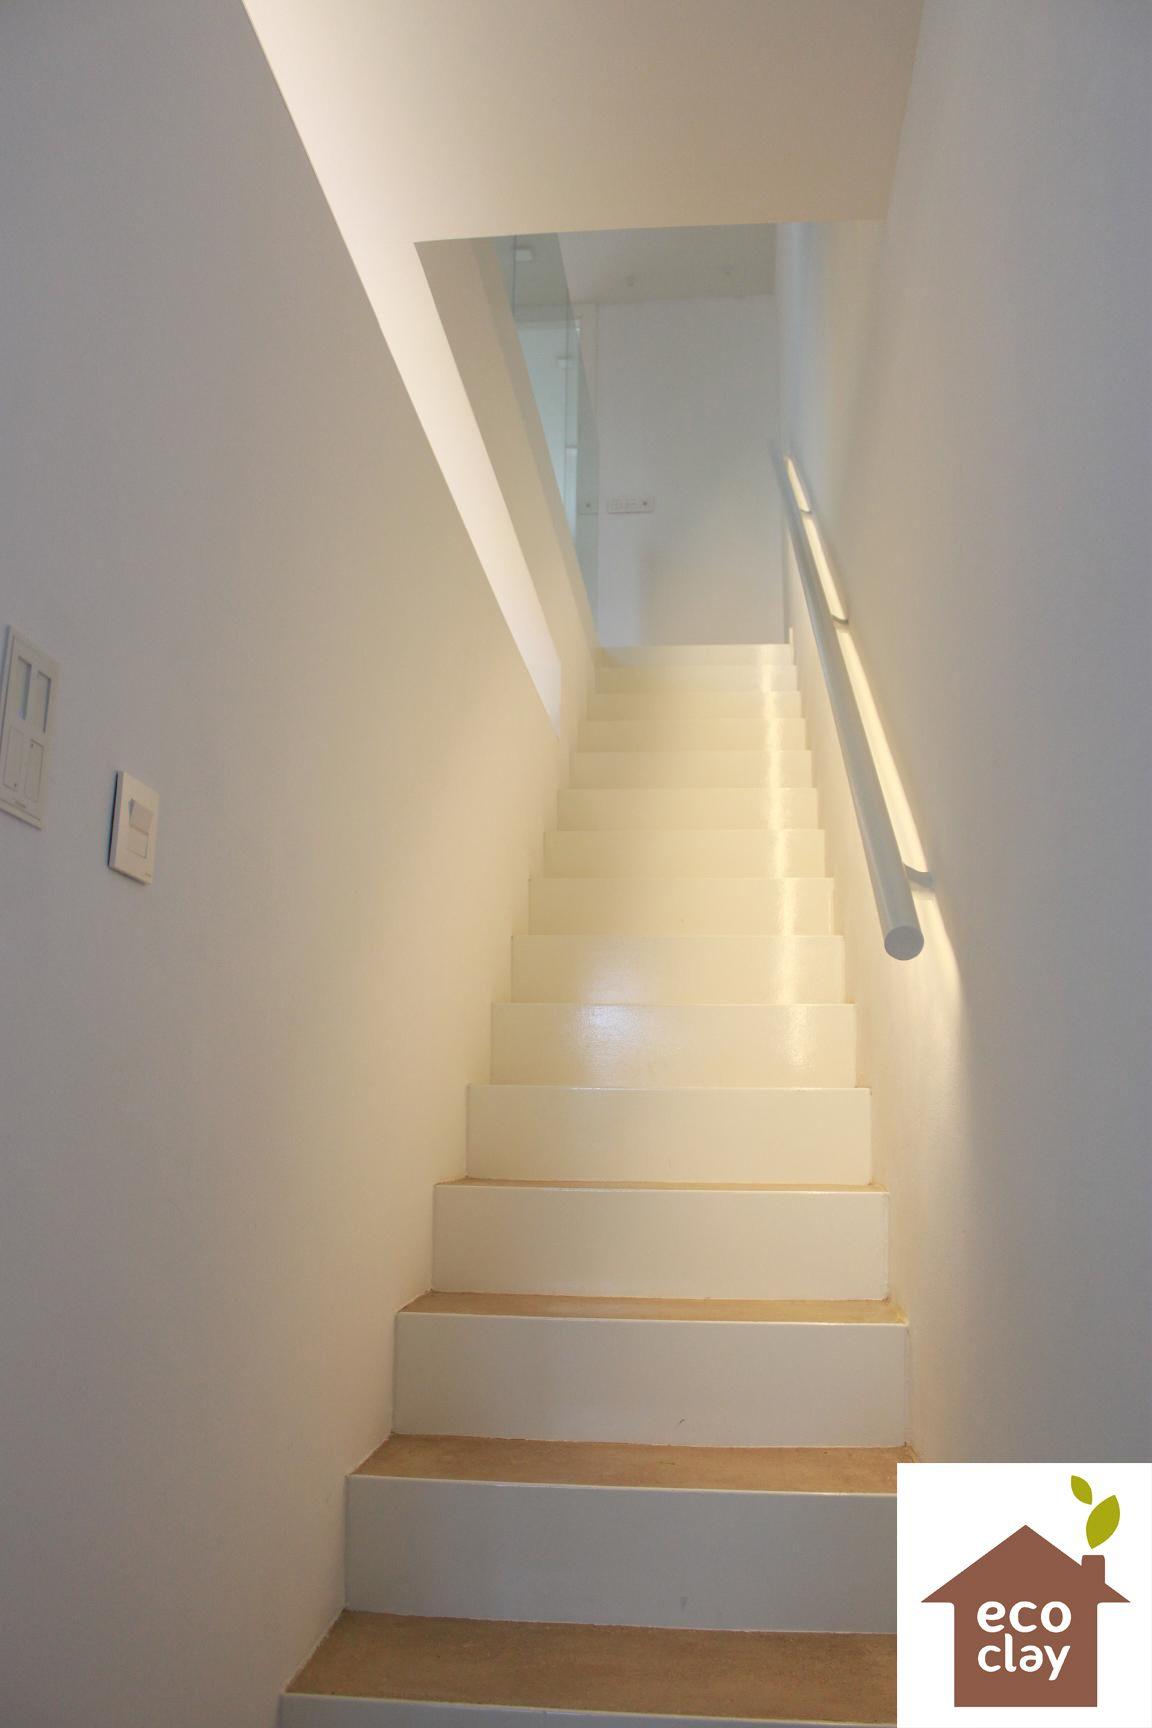 Costa Blanca Detalle Escalera Revocos Ecoclay Juego De Luces - Luces-indirectas